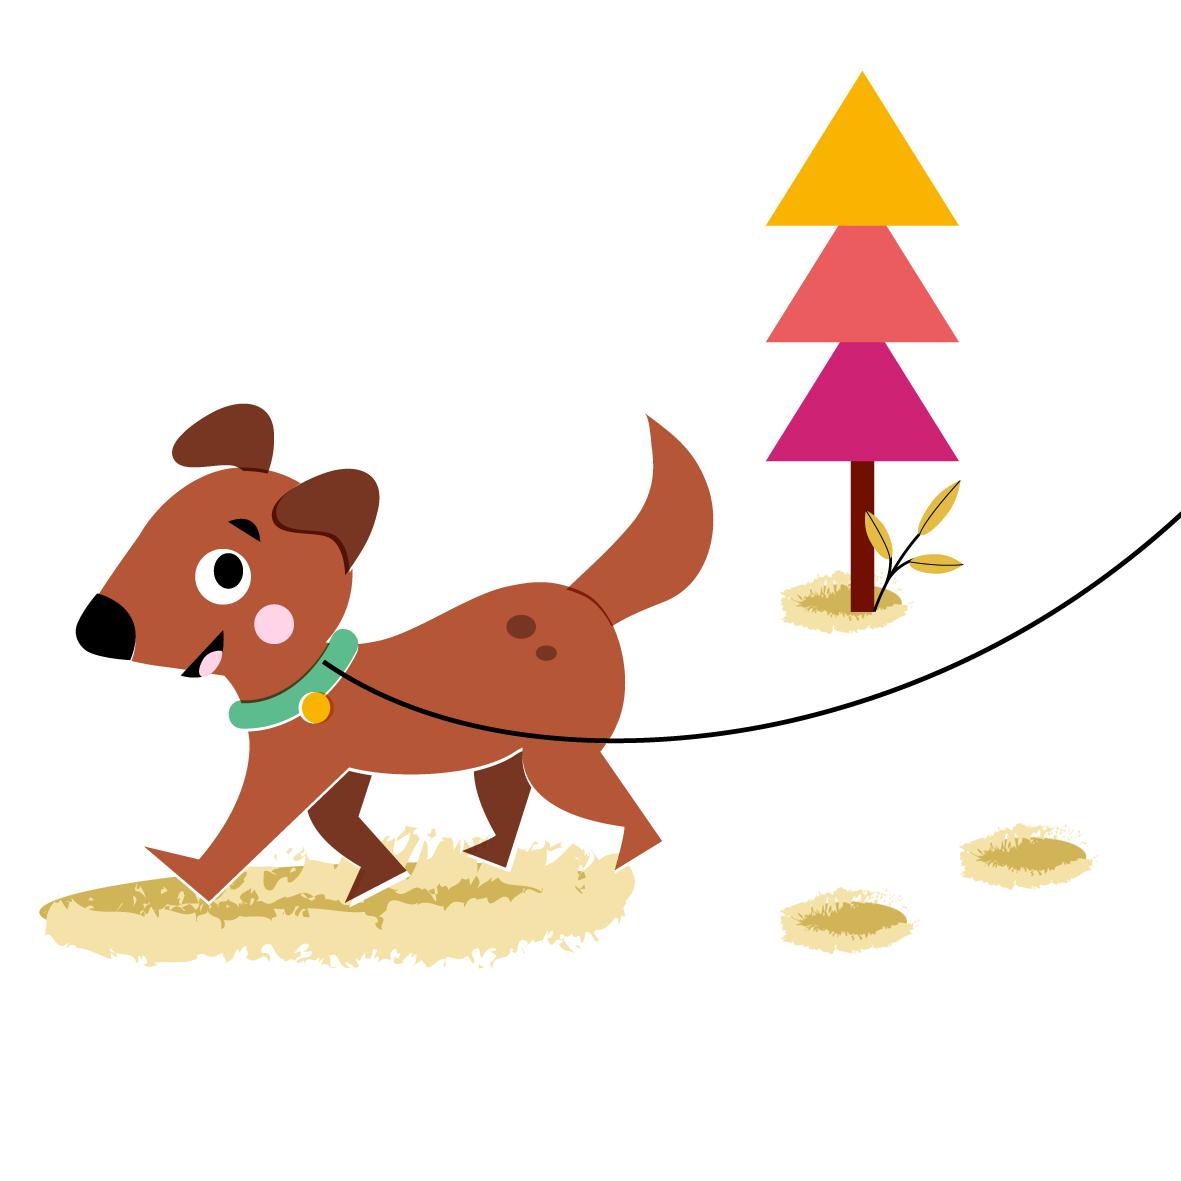 Walking puppy - Vector Illustration © Emeline Barrea, All rights reserved